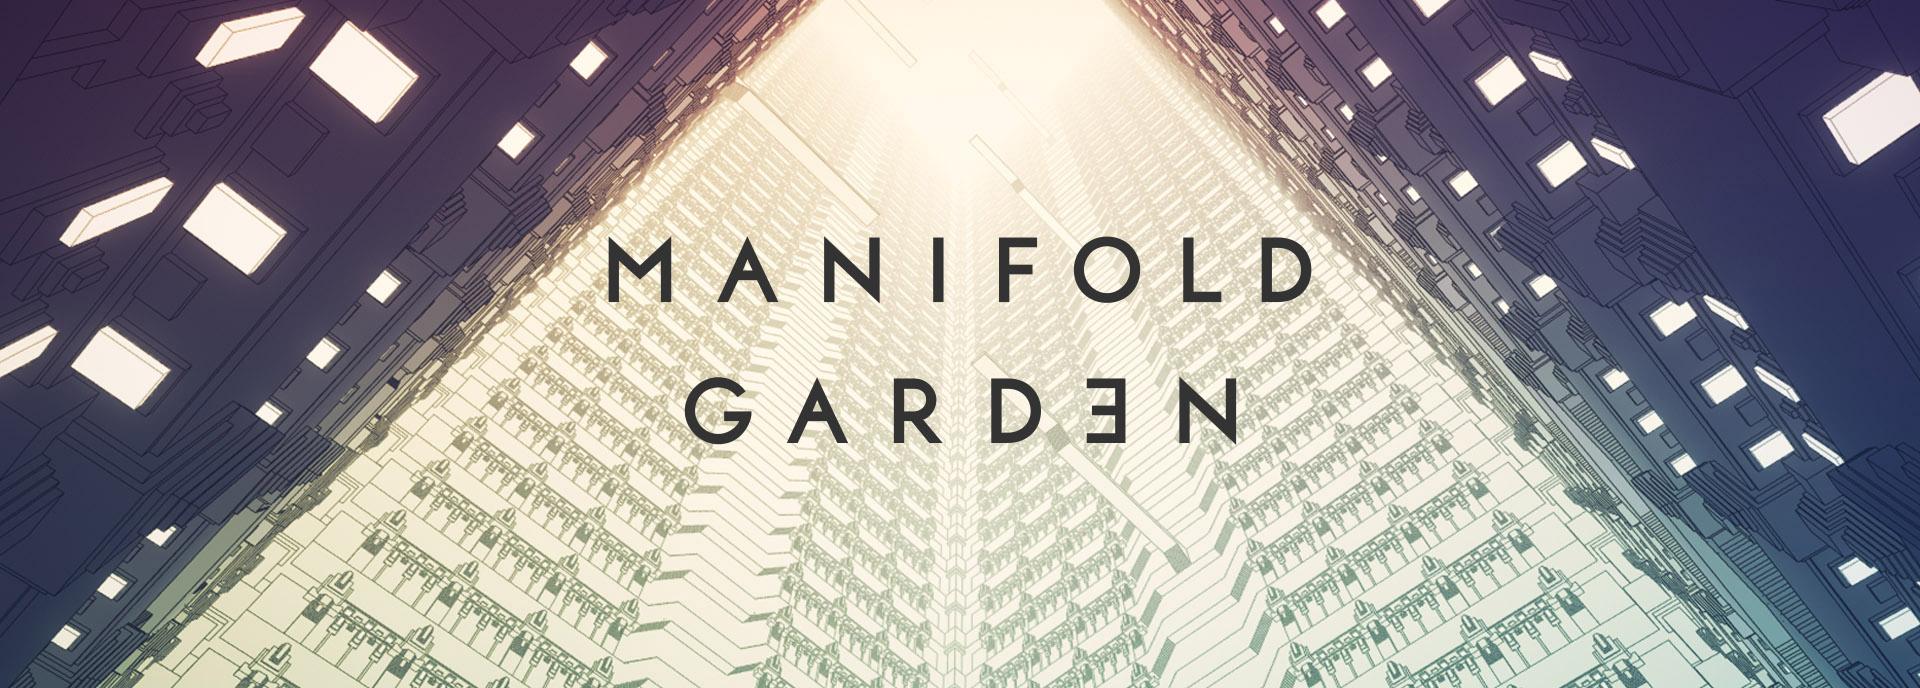 Purchase Manifold Garden